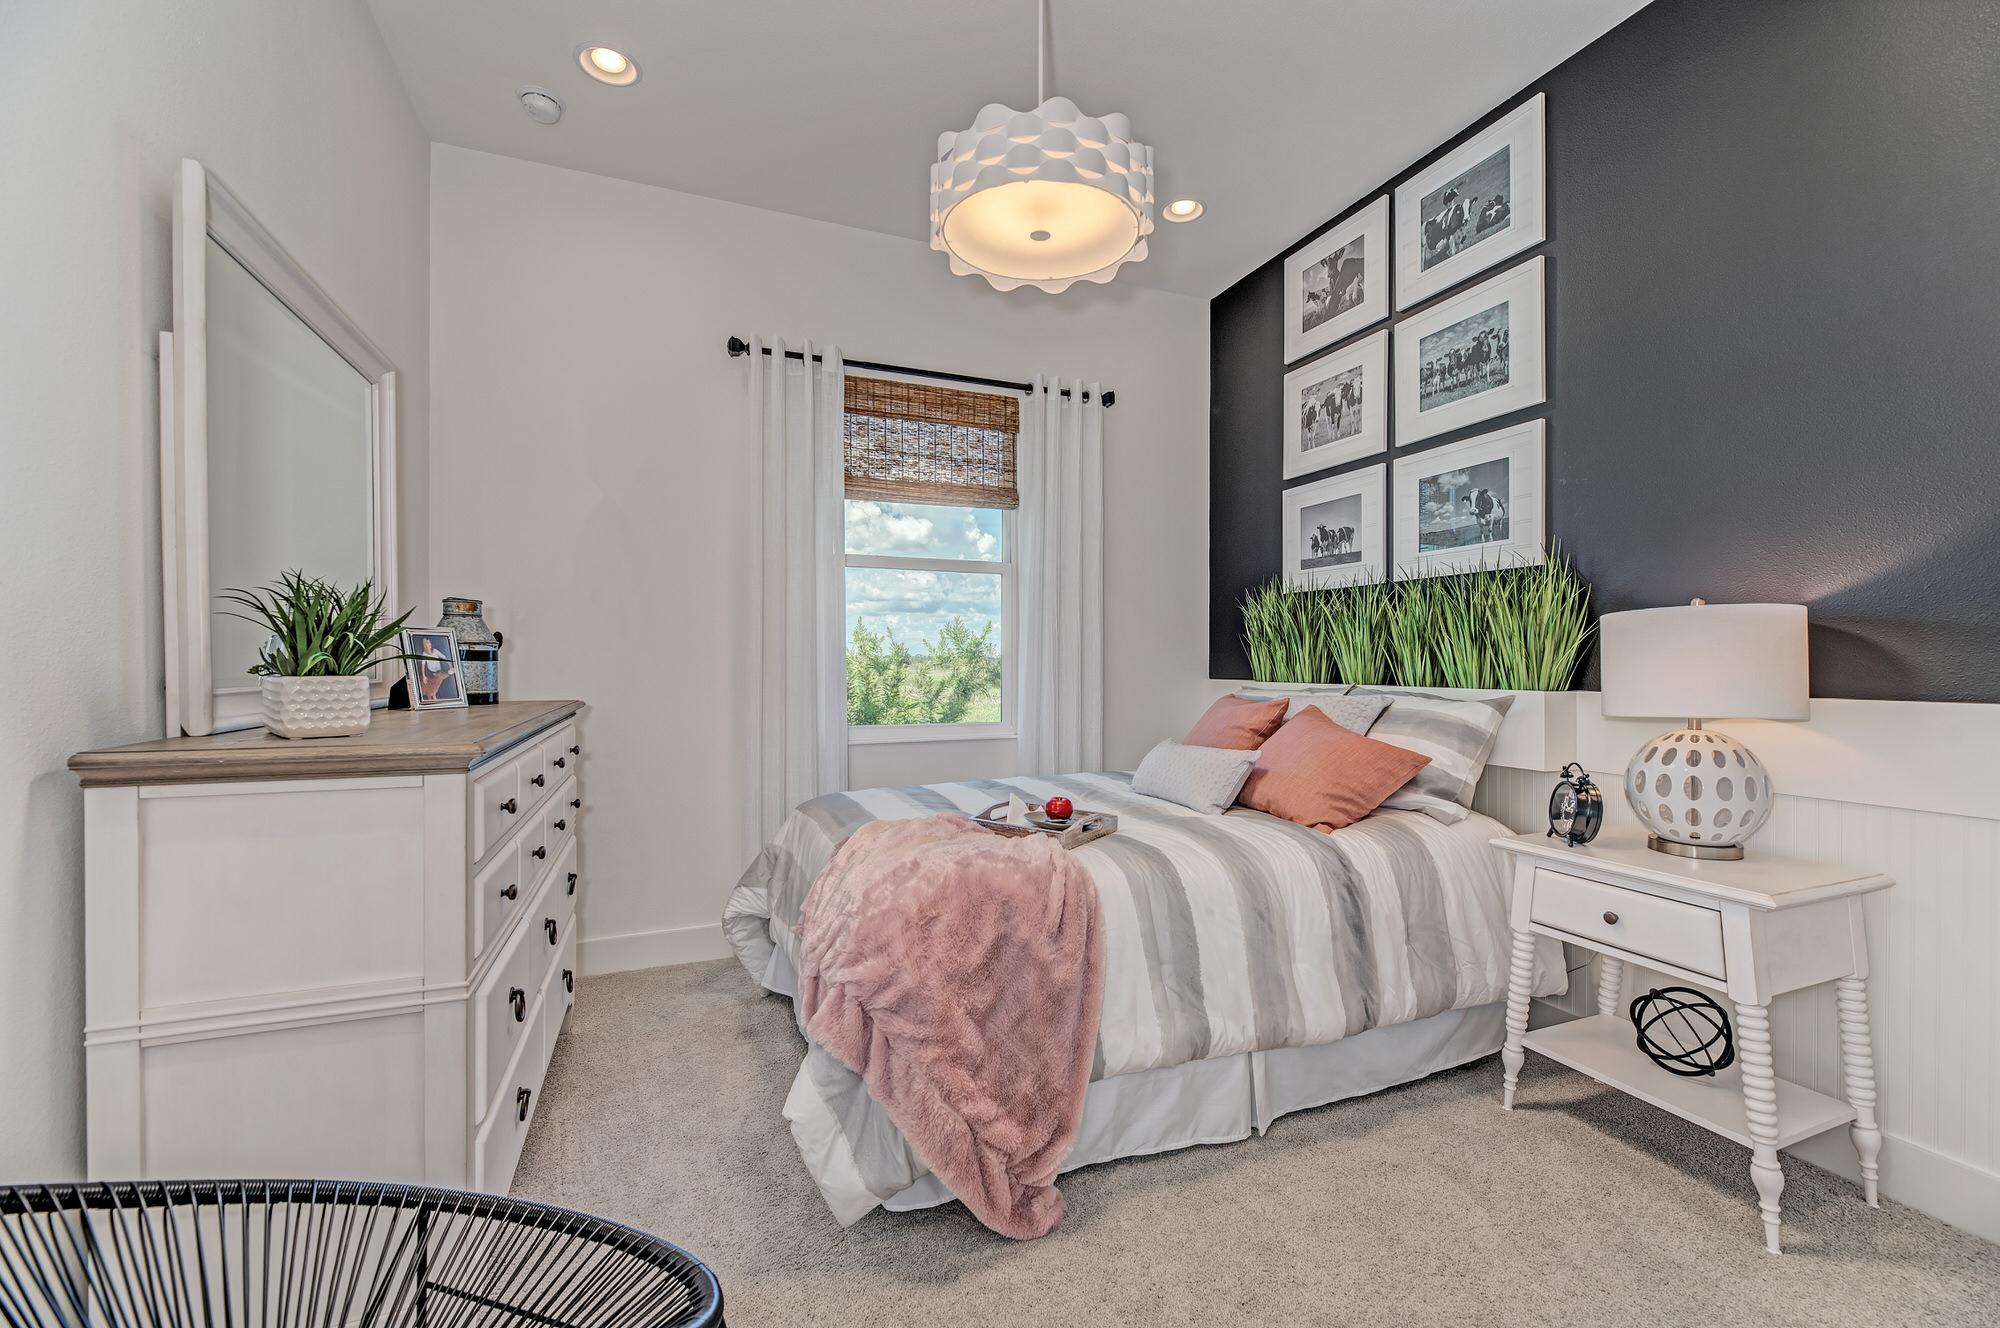 Bedroom featured in the Barbados 2800 3 Car Garage By Medallion Home in Sarasota-Bradenton, FL